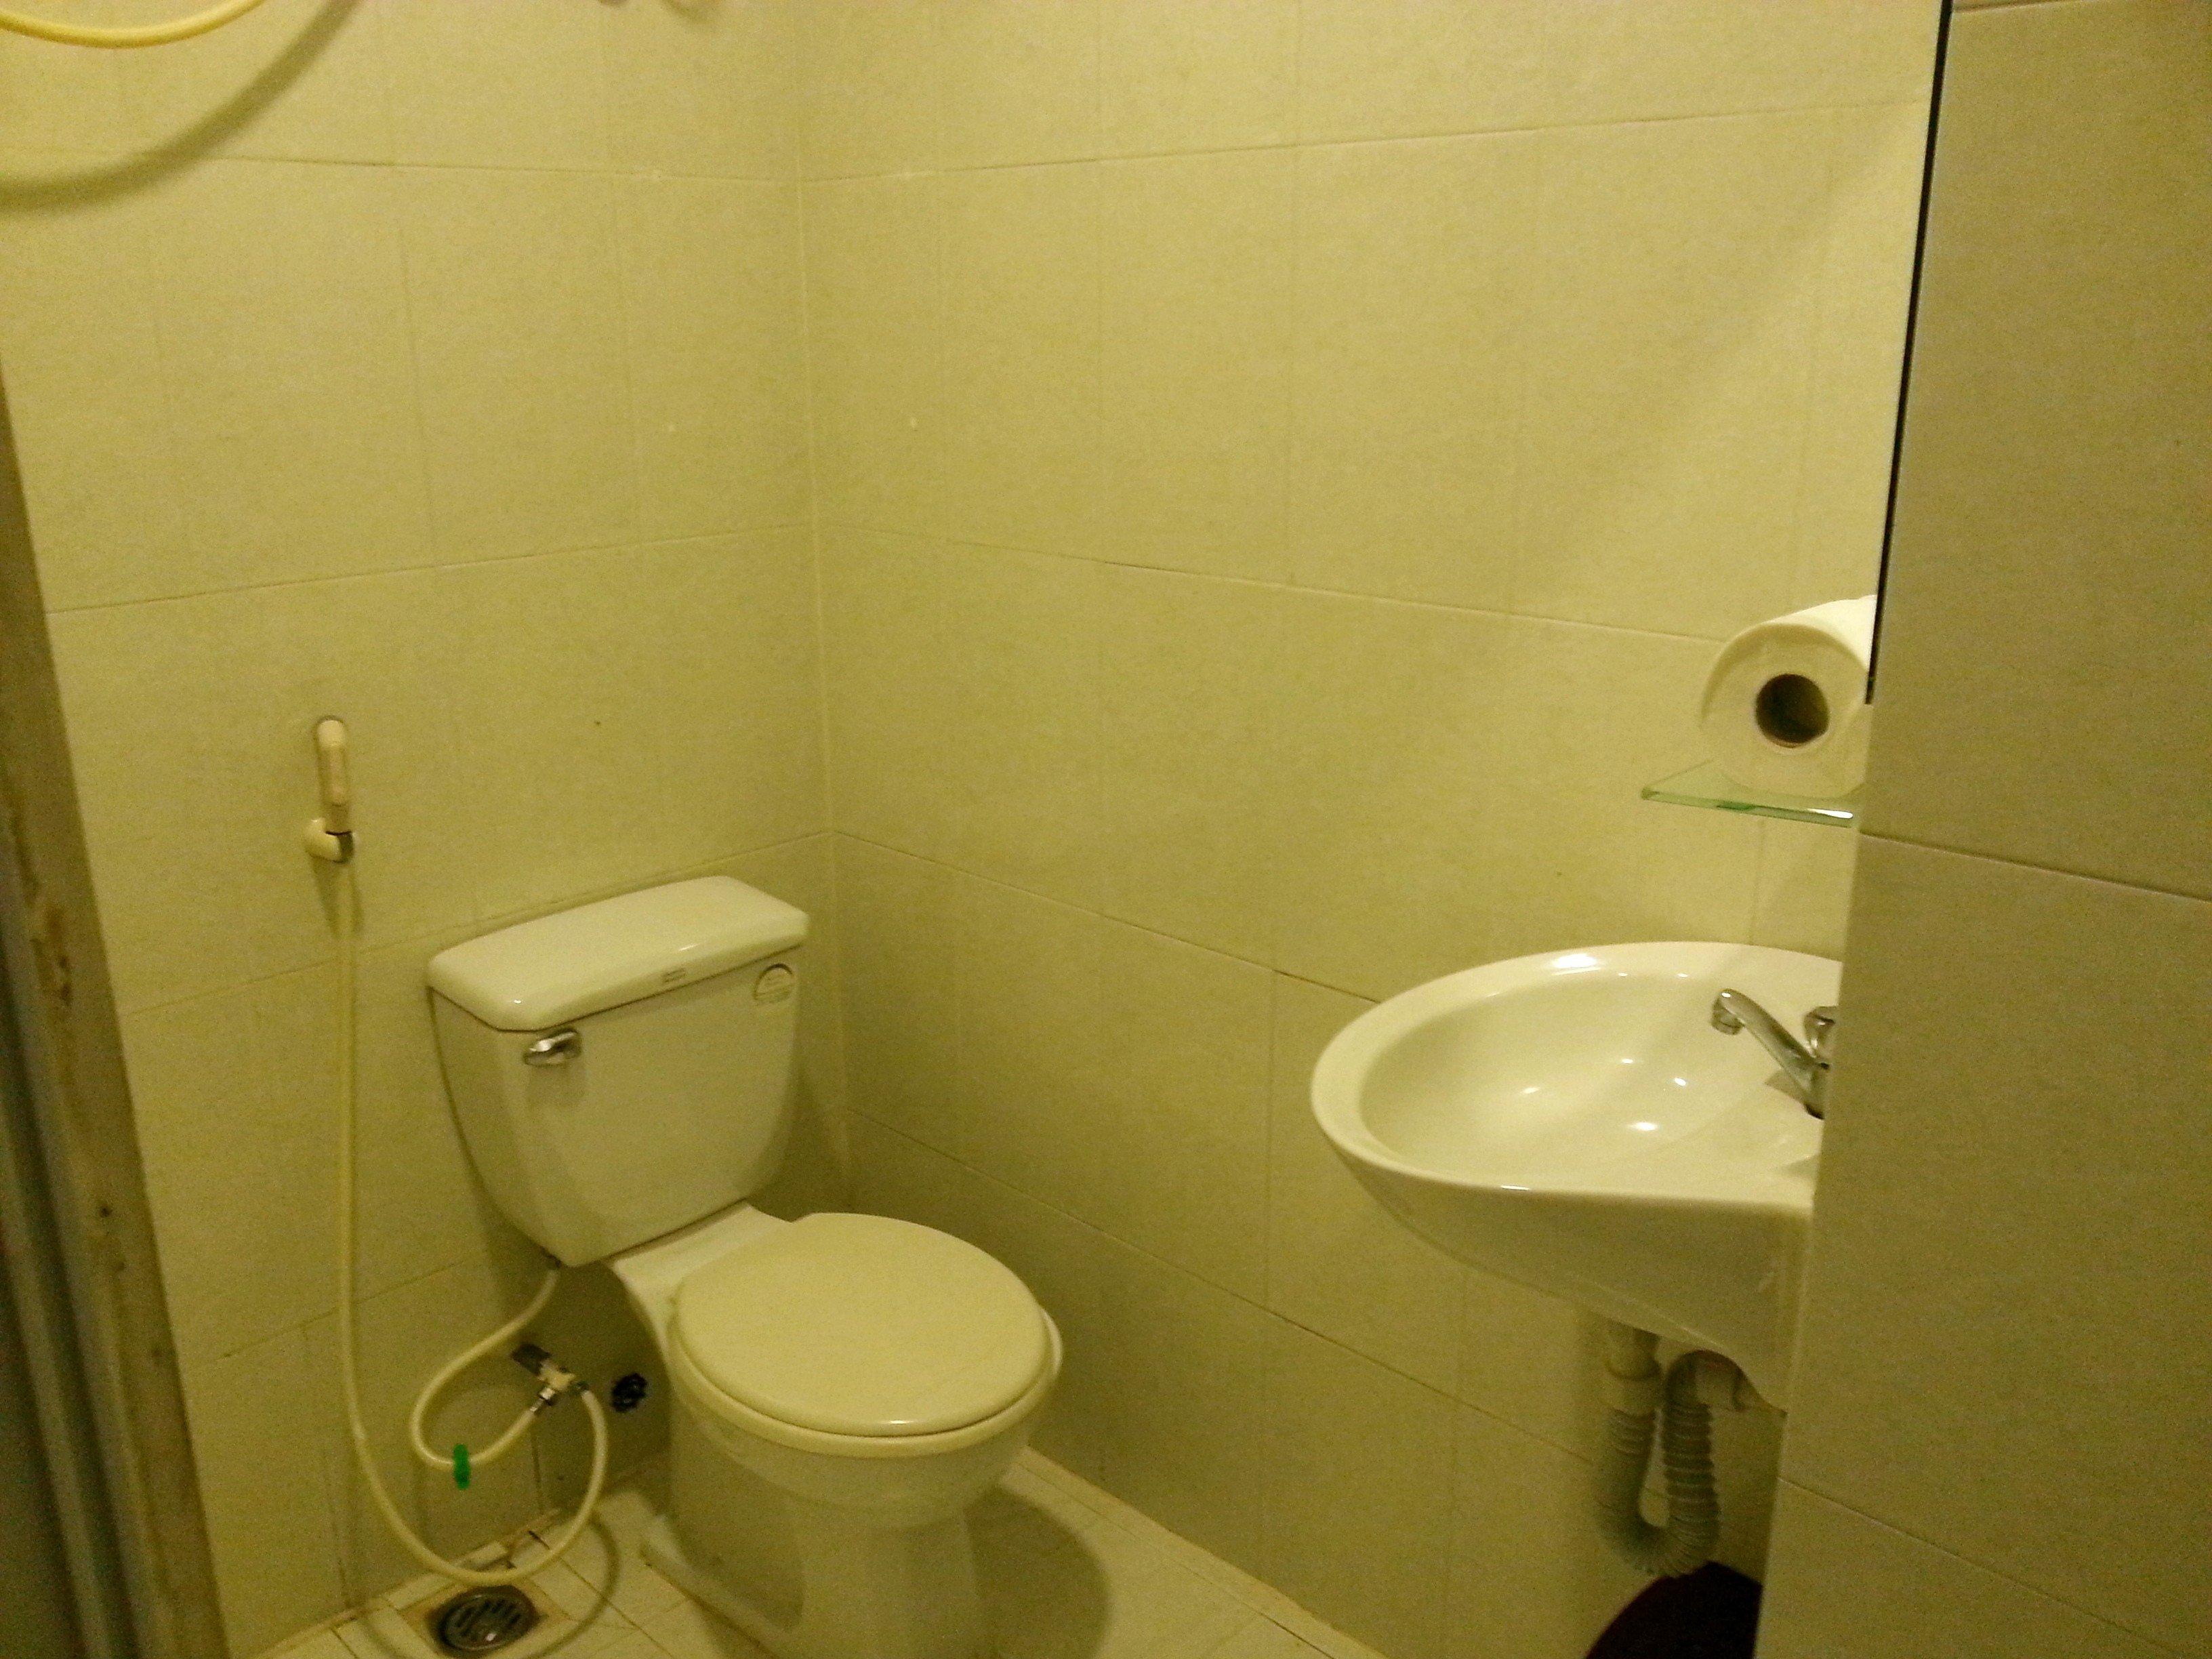 Bathroom at the Ha Vy Hotel